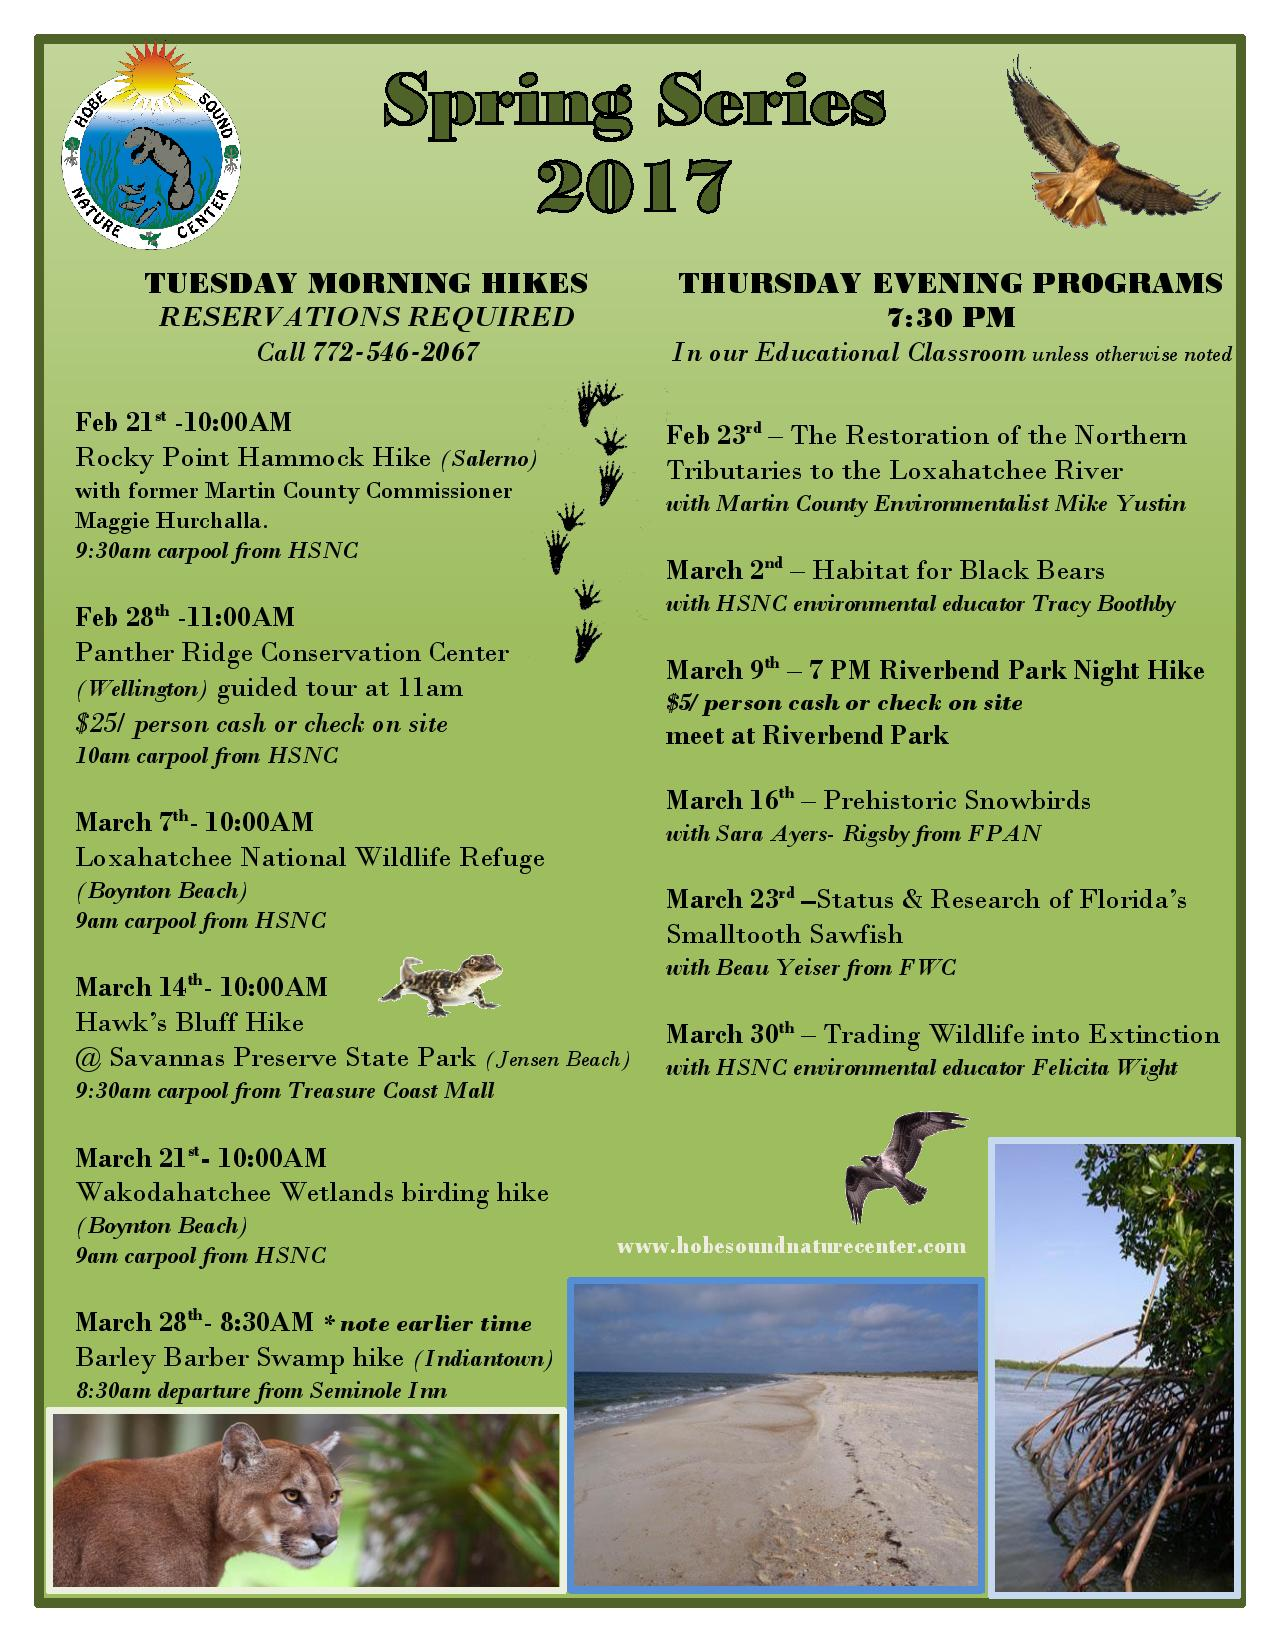 Hobe Sound Nature Center Spring Series